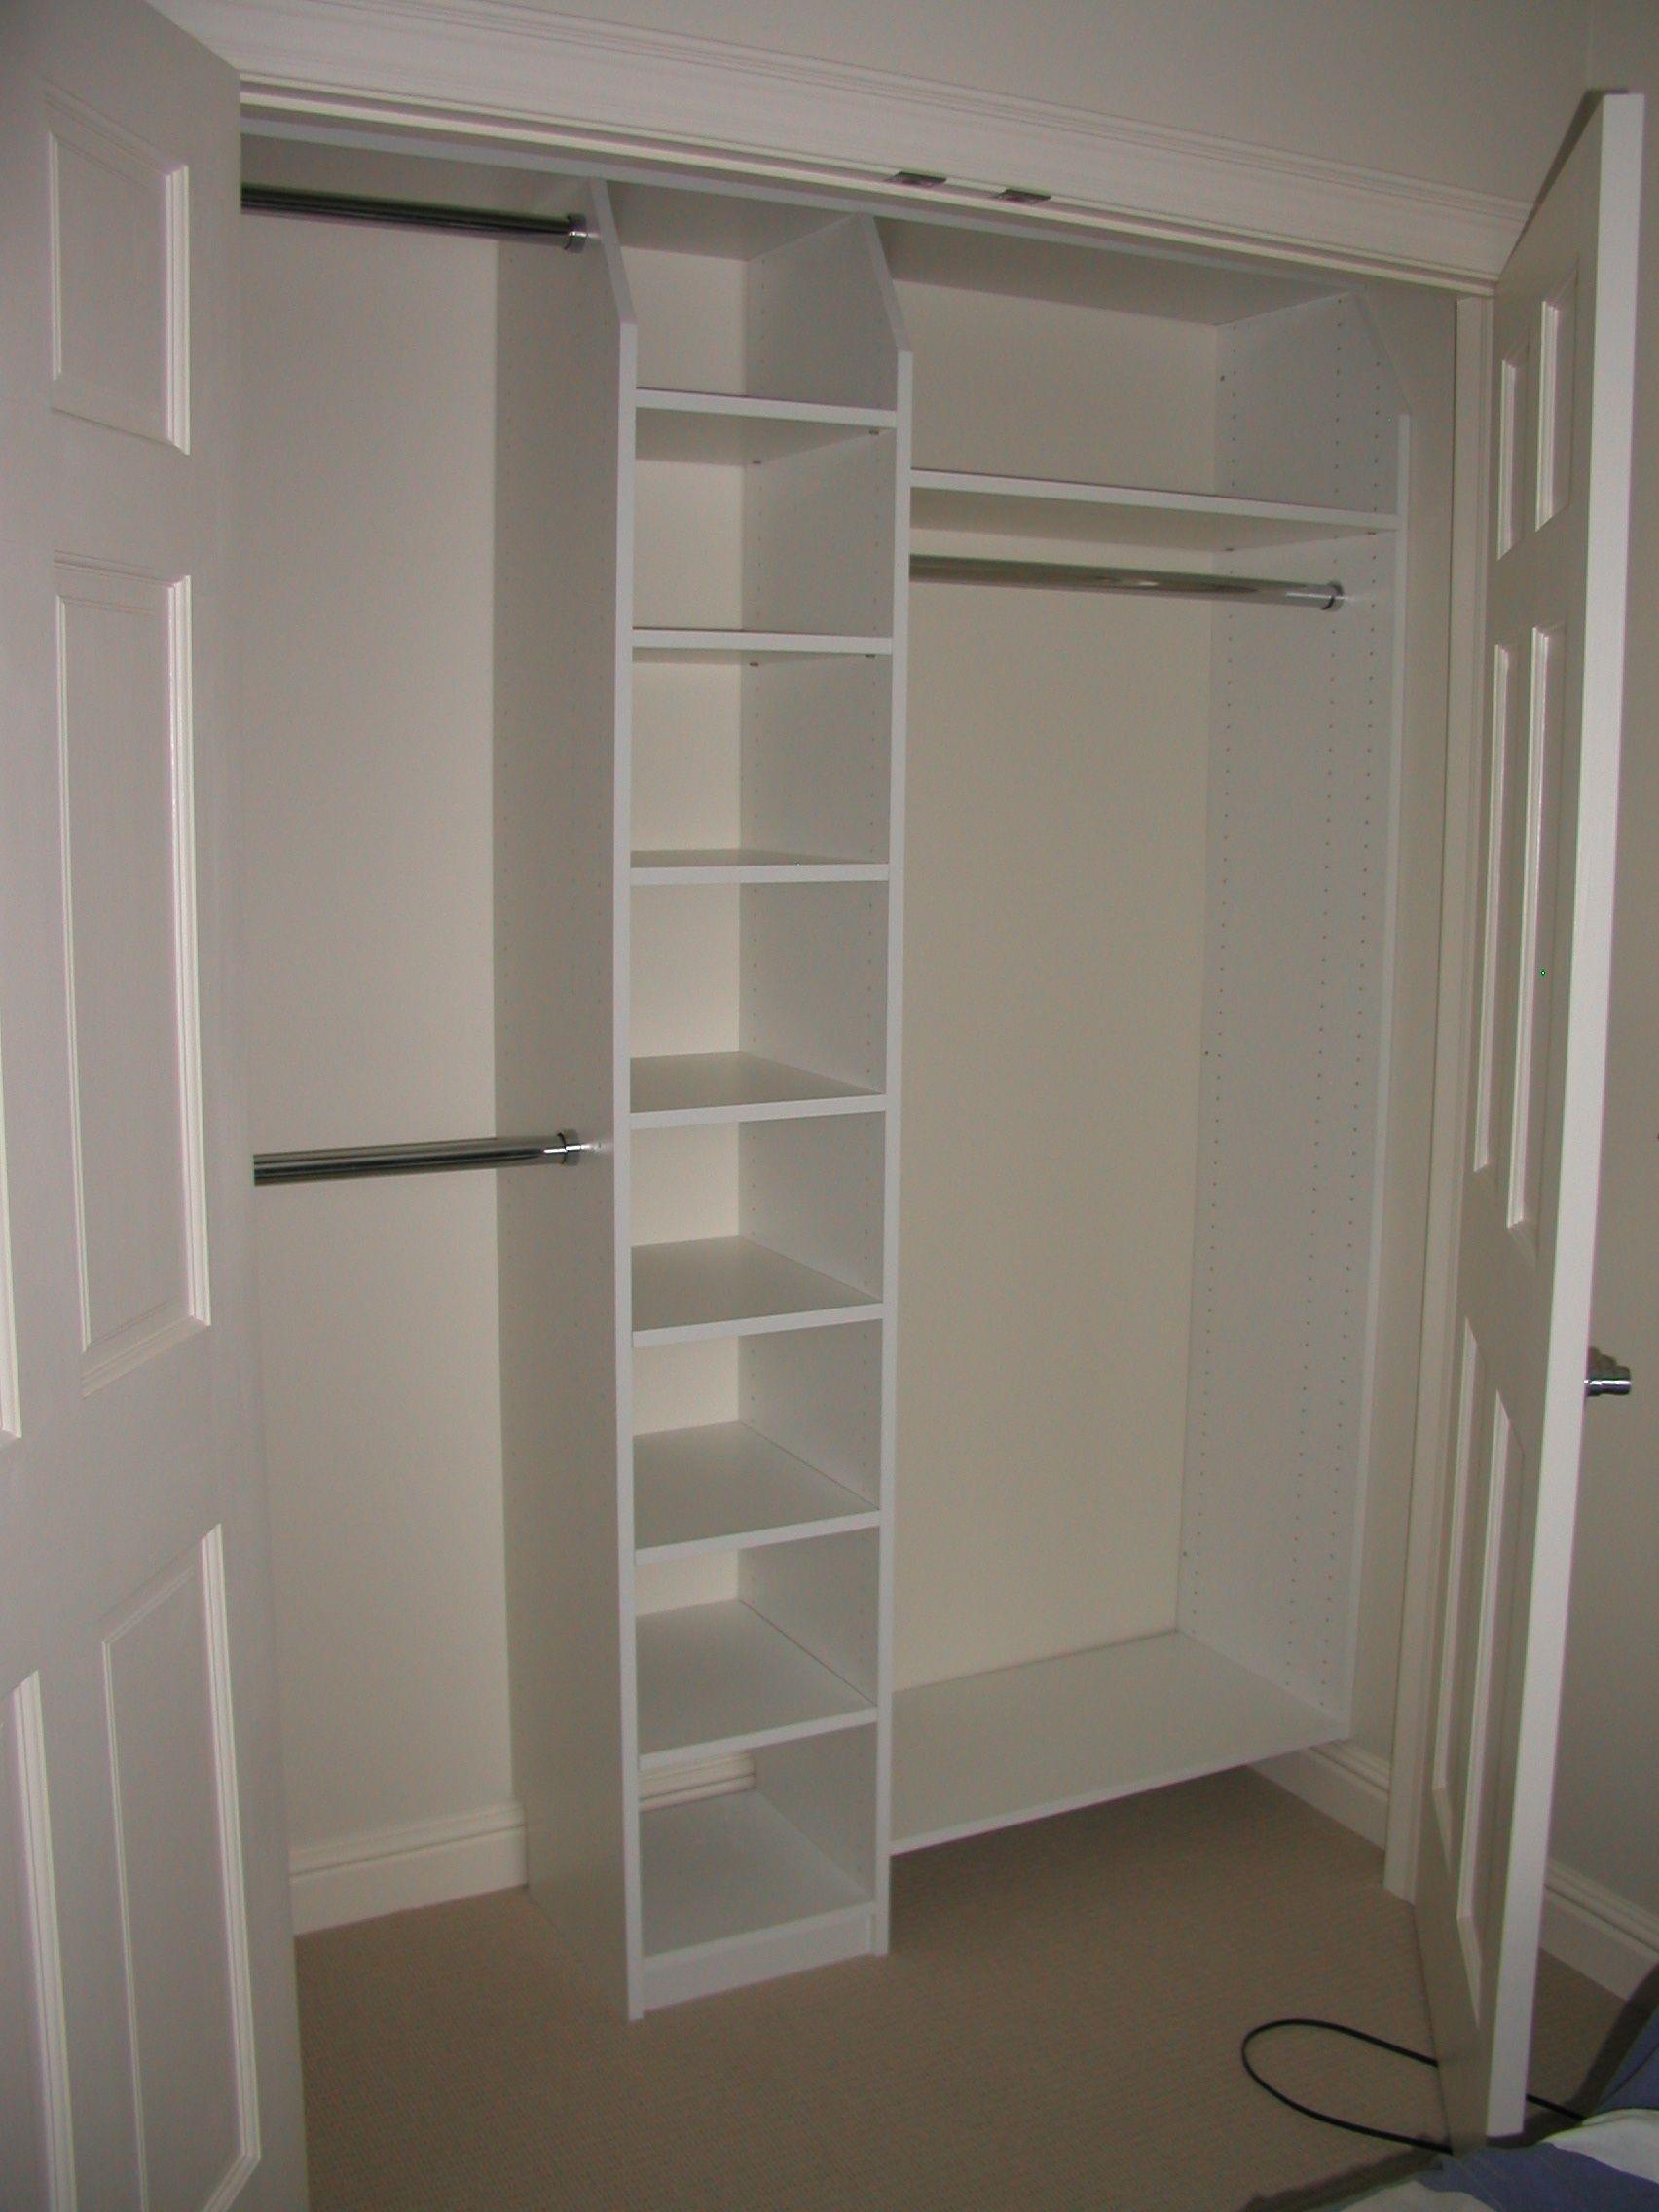 70 elegant walk in closet design ideas layout dan tips - Small closet design layout ...